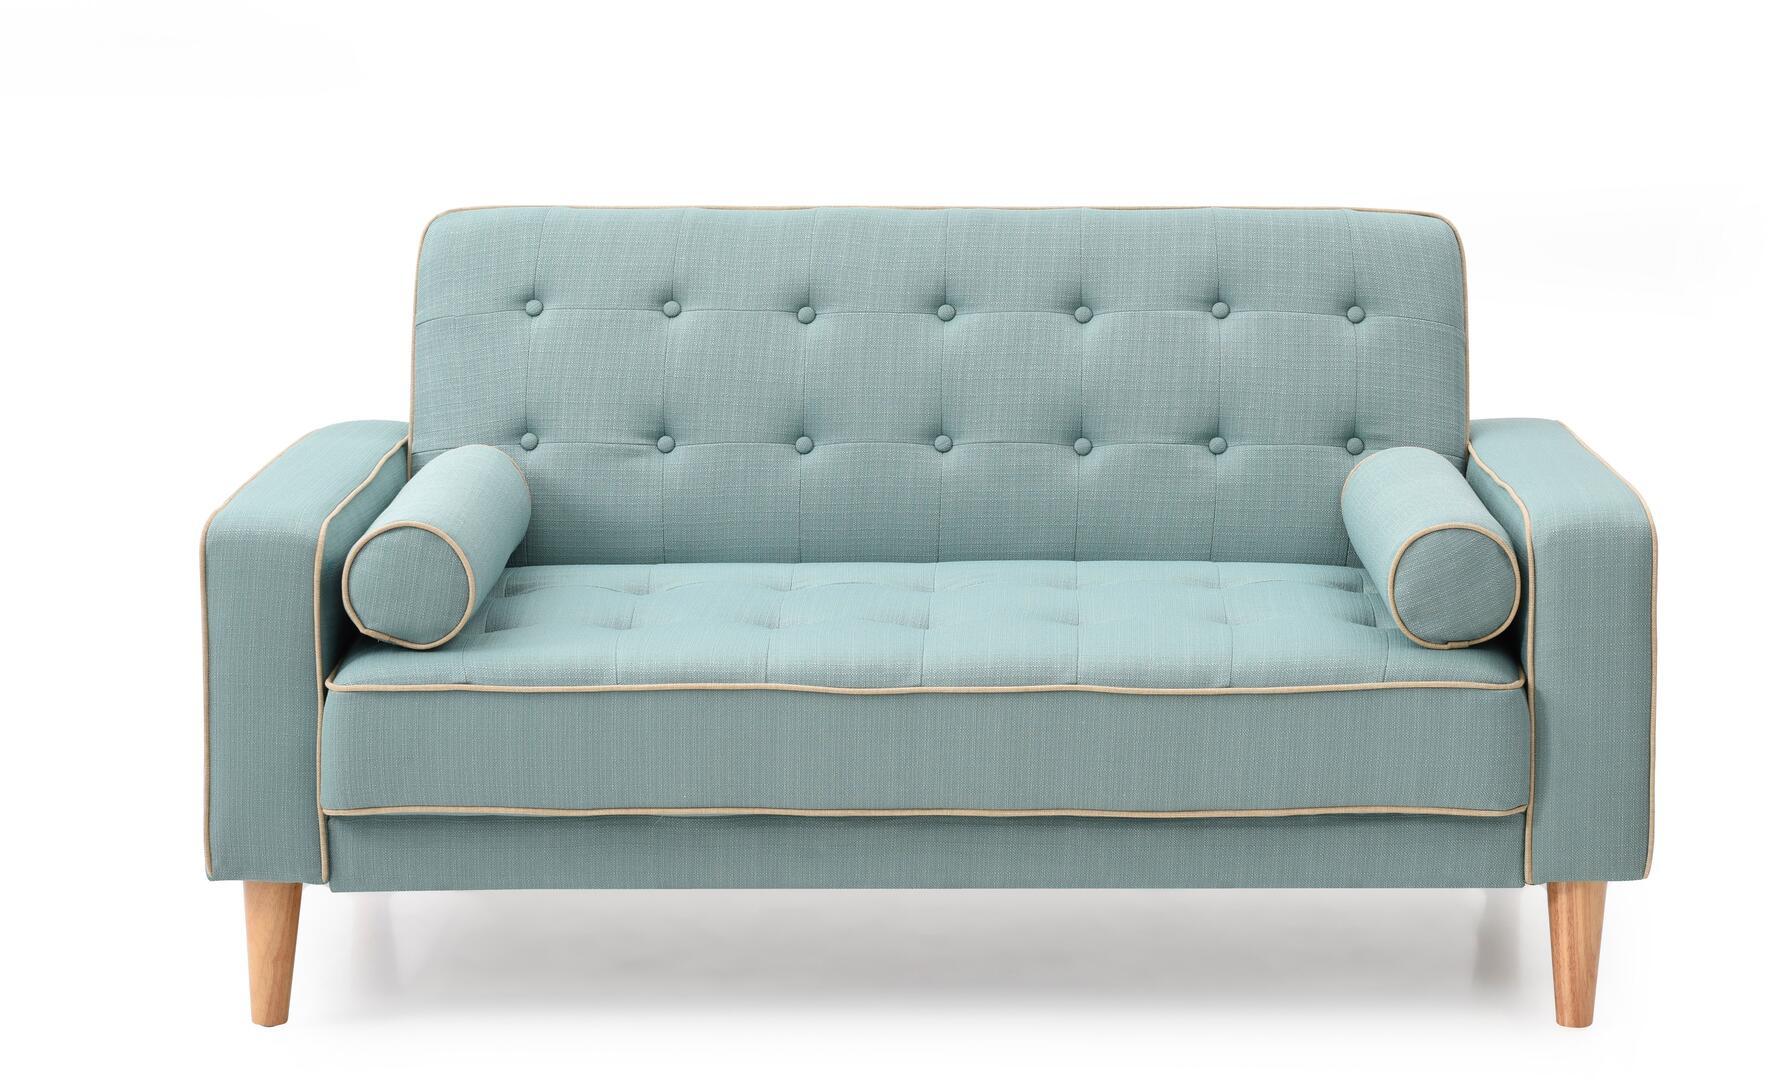 Glory Furniture G833al Navi Series Loveseat Sleeper Fabric Sofa